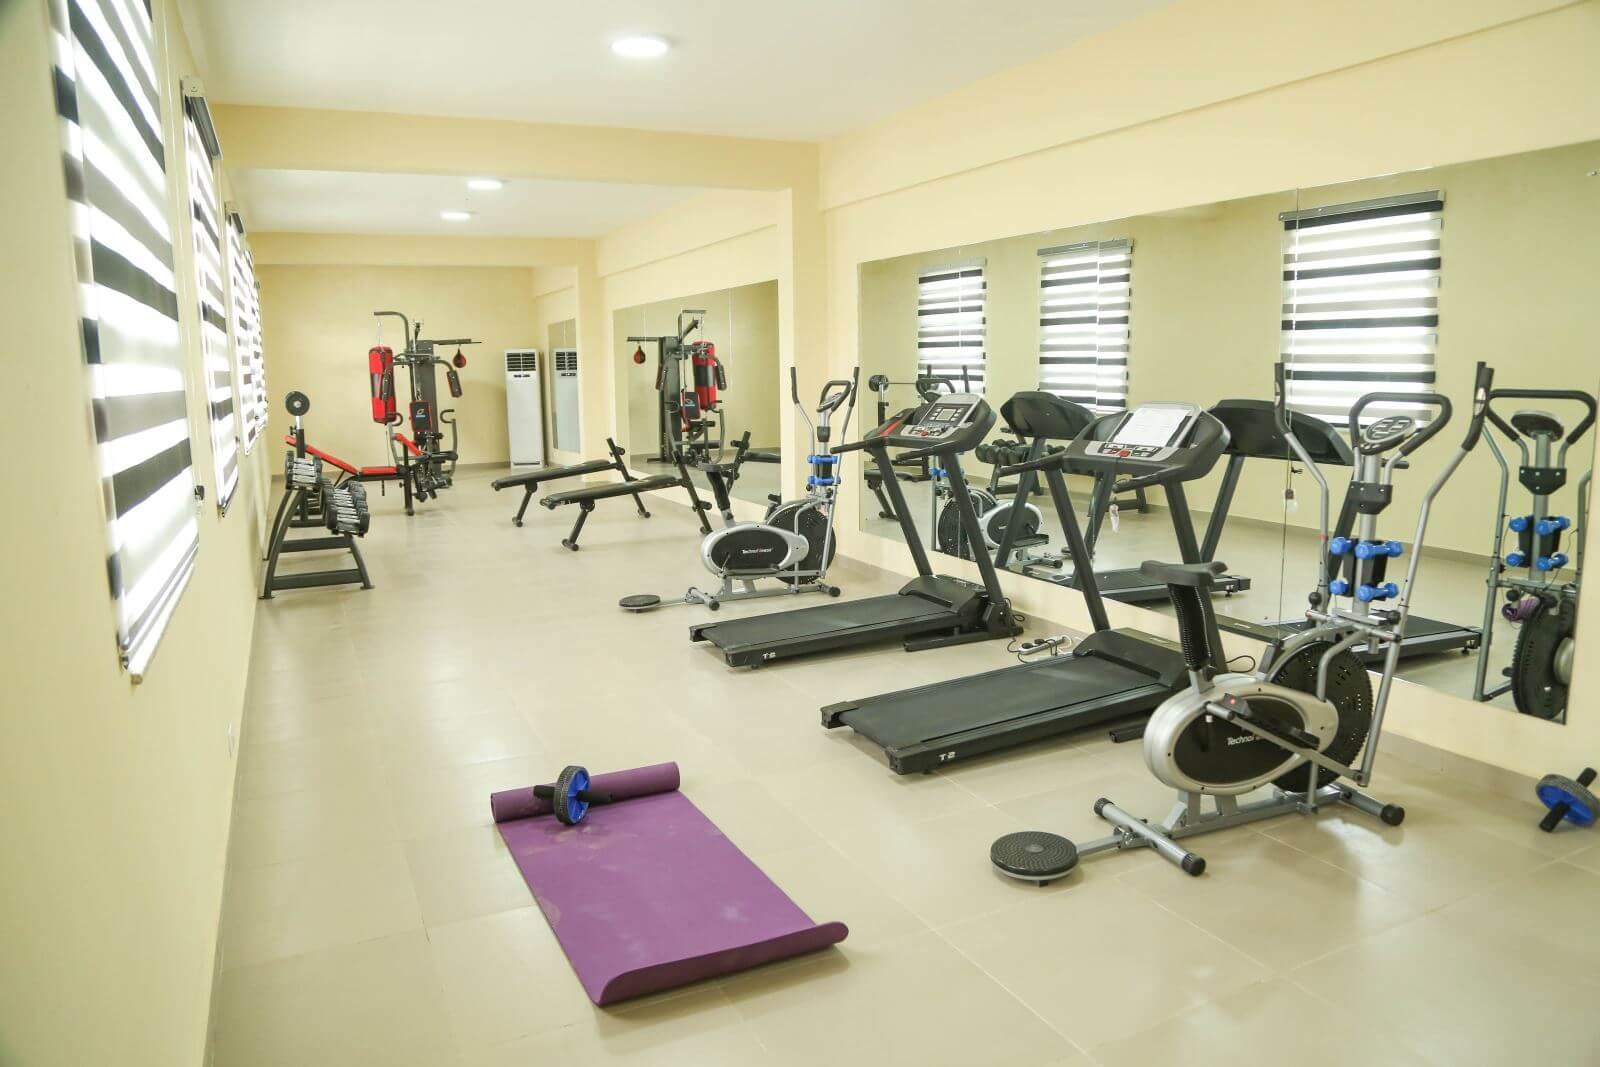 hostel-accomodation 3